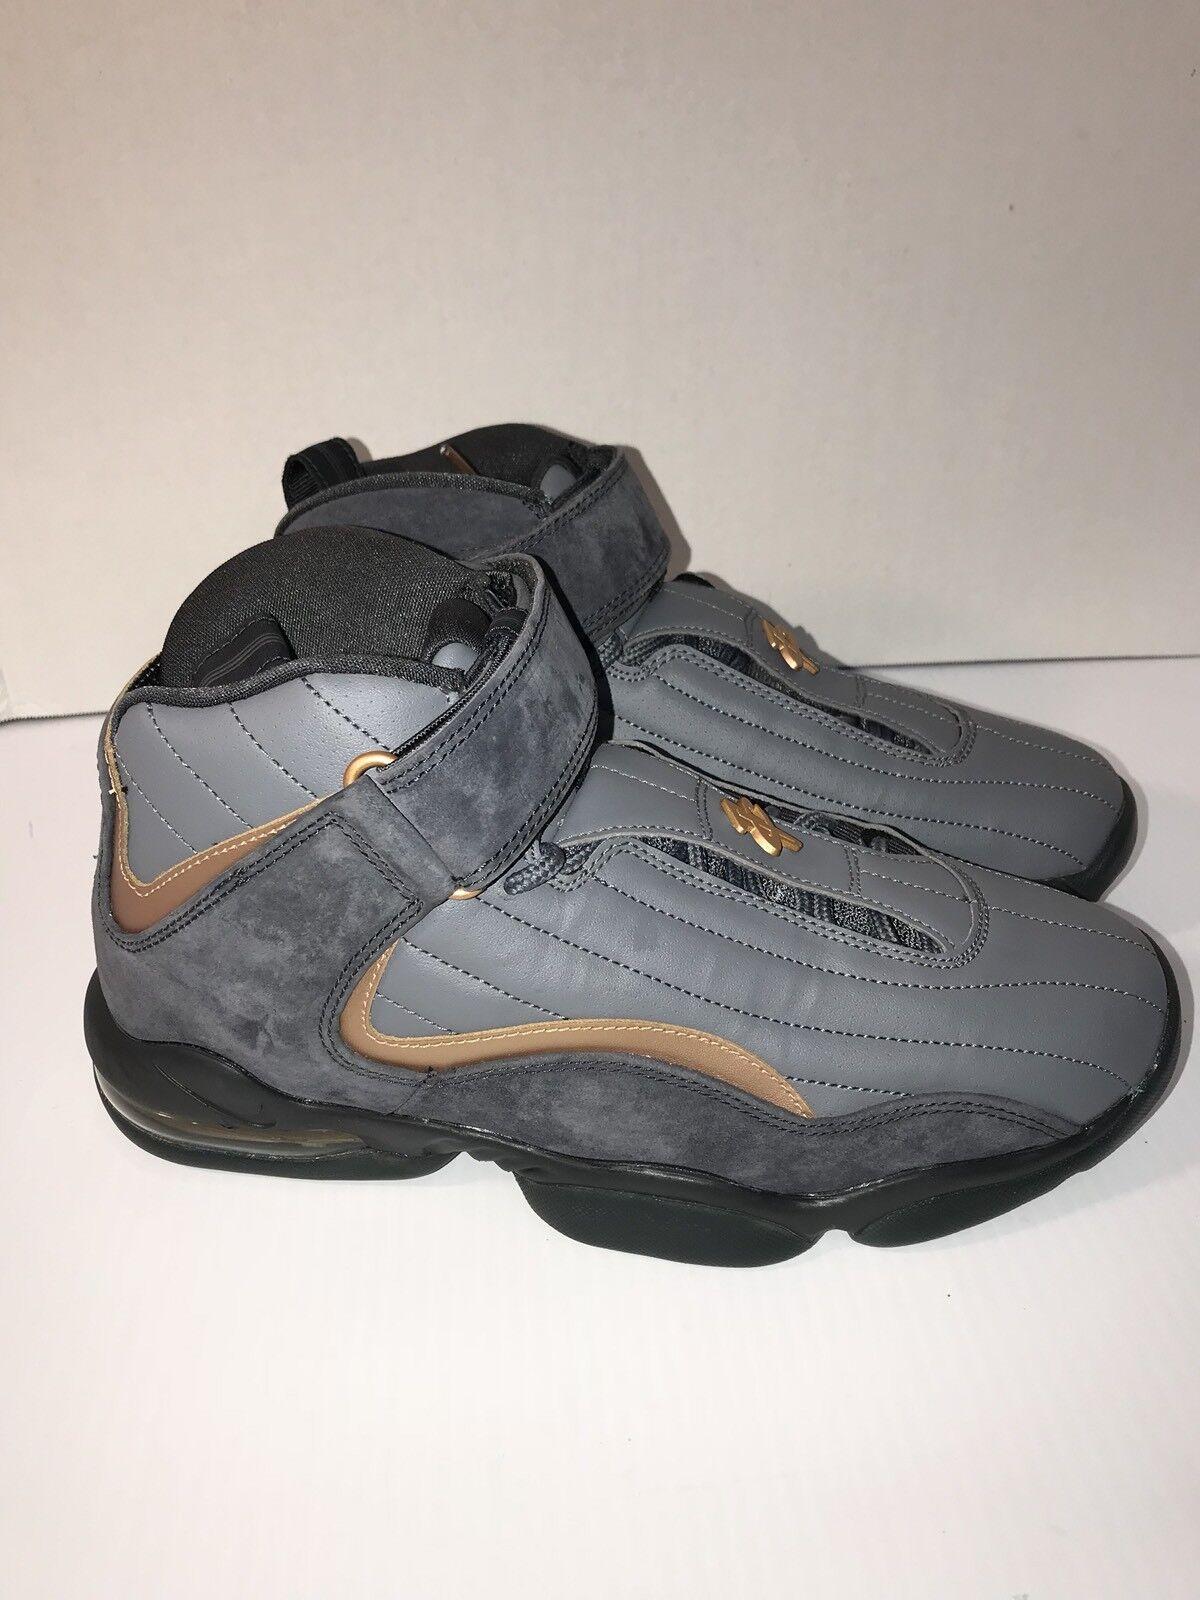 [864018-002] nike air penny iv lupo grigio mtllc coppercoin uomini scarpe sz - 8